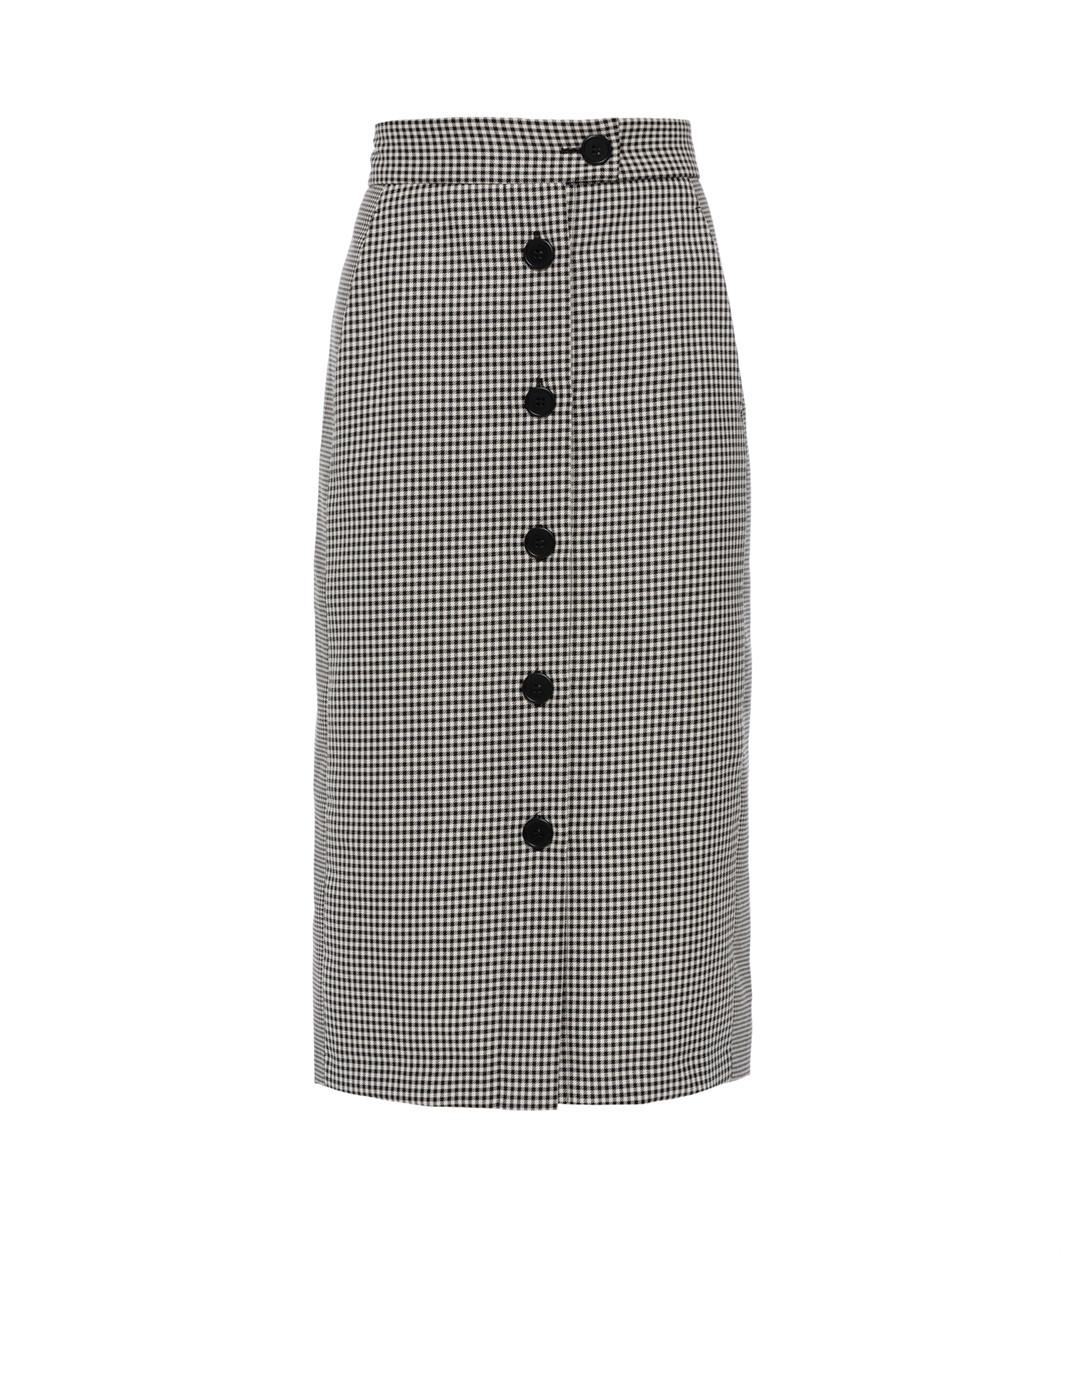 6b0785685f52 White and Black Plaid Checked Midi Skirt   Tara Jarmon   Halsbrook